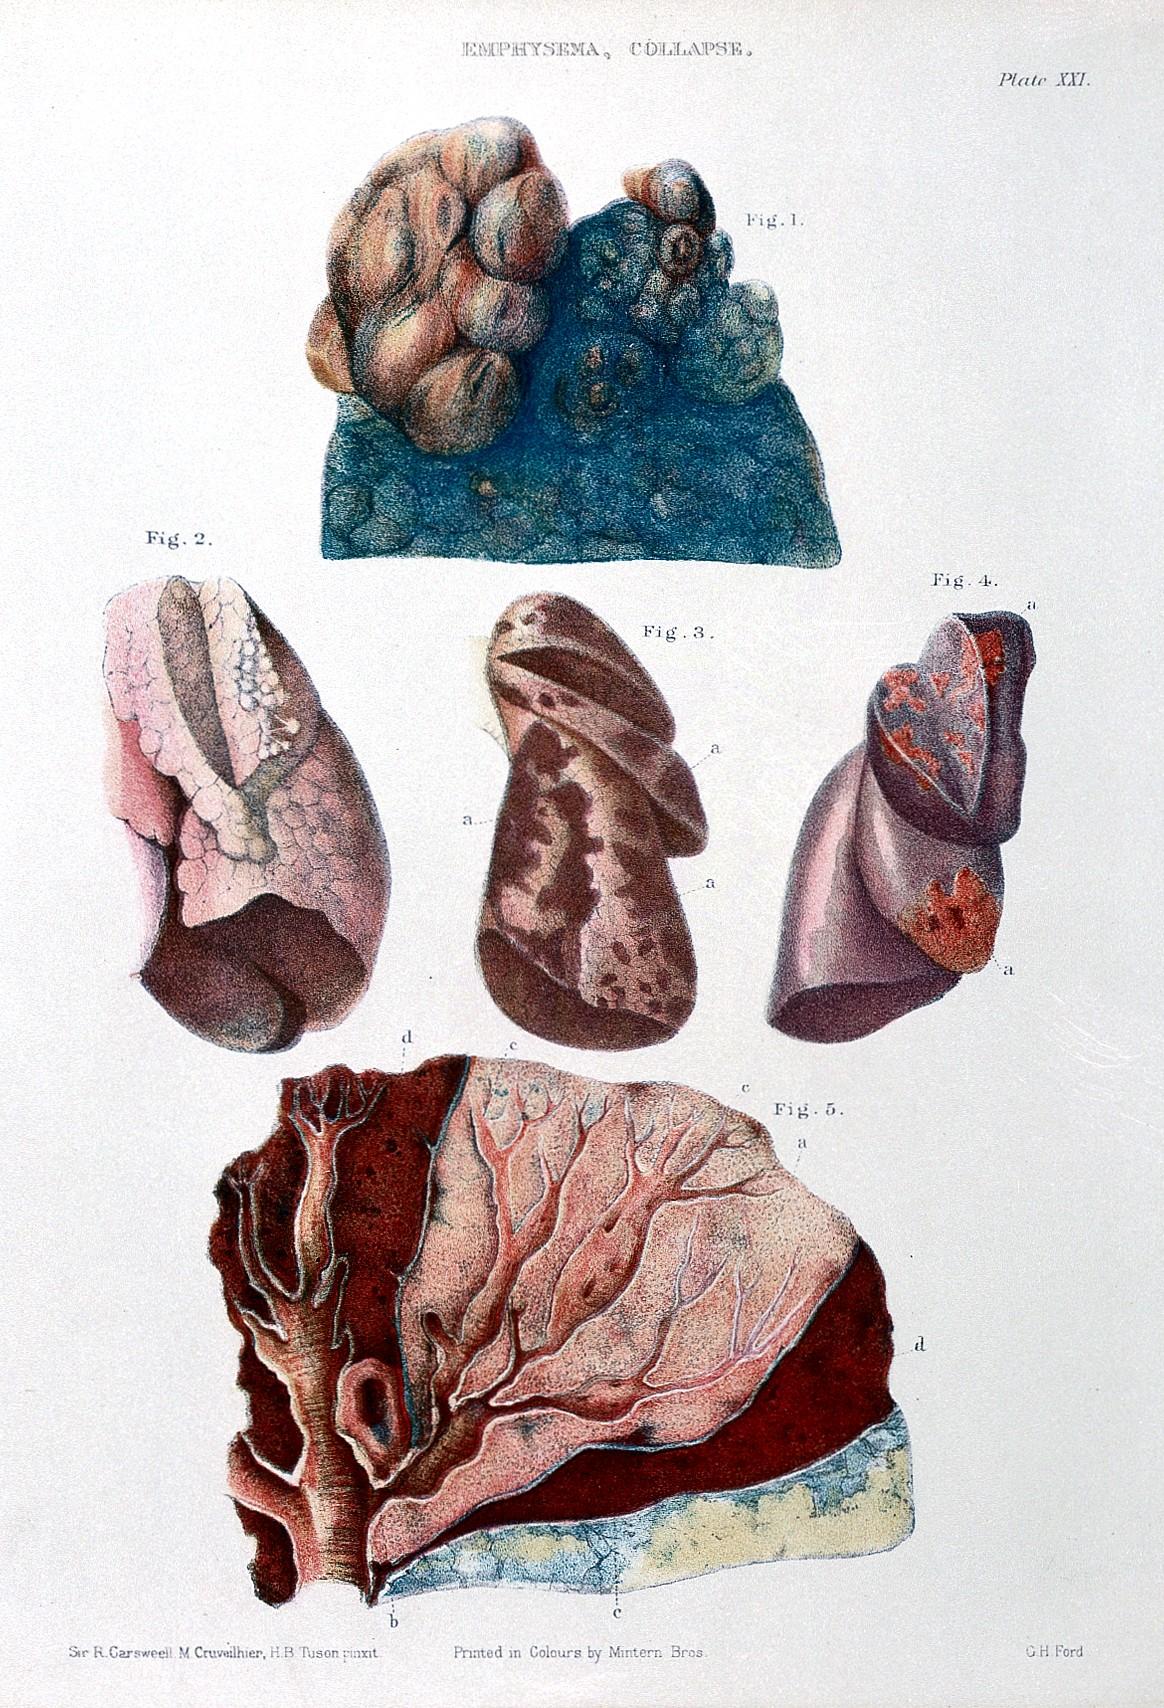 File:W. Fox, Pathological anatomy of the lungs; emphysema Wellcome ...